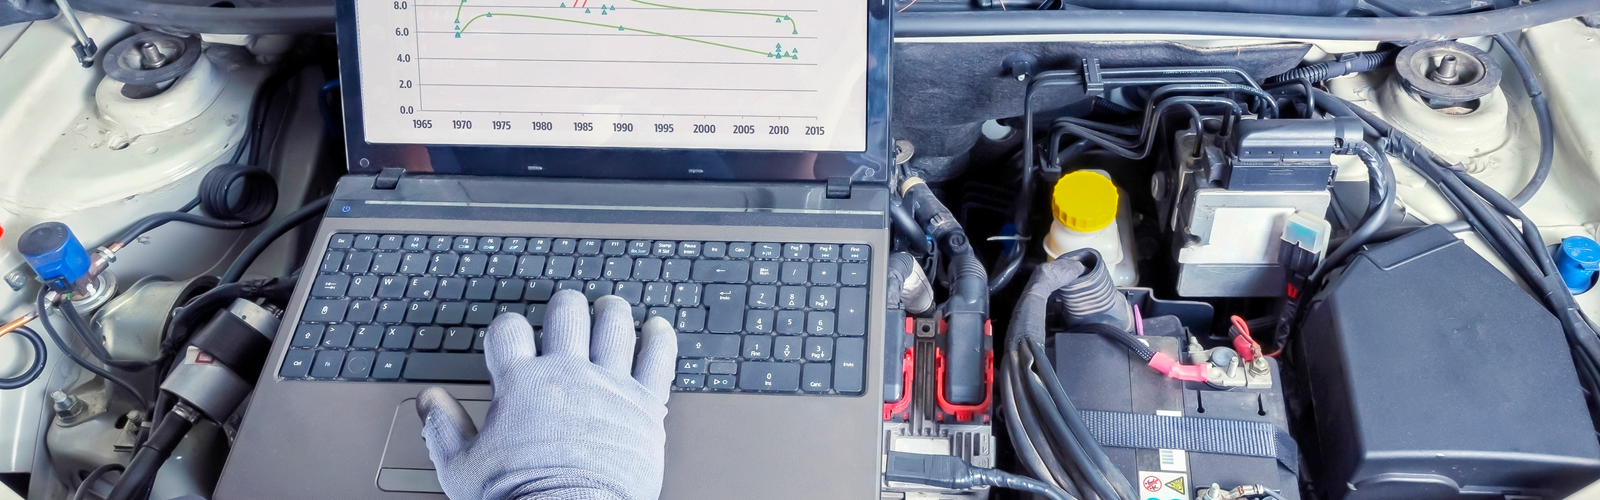 Service Maintenance and Repair